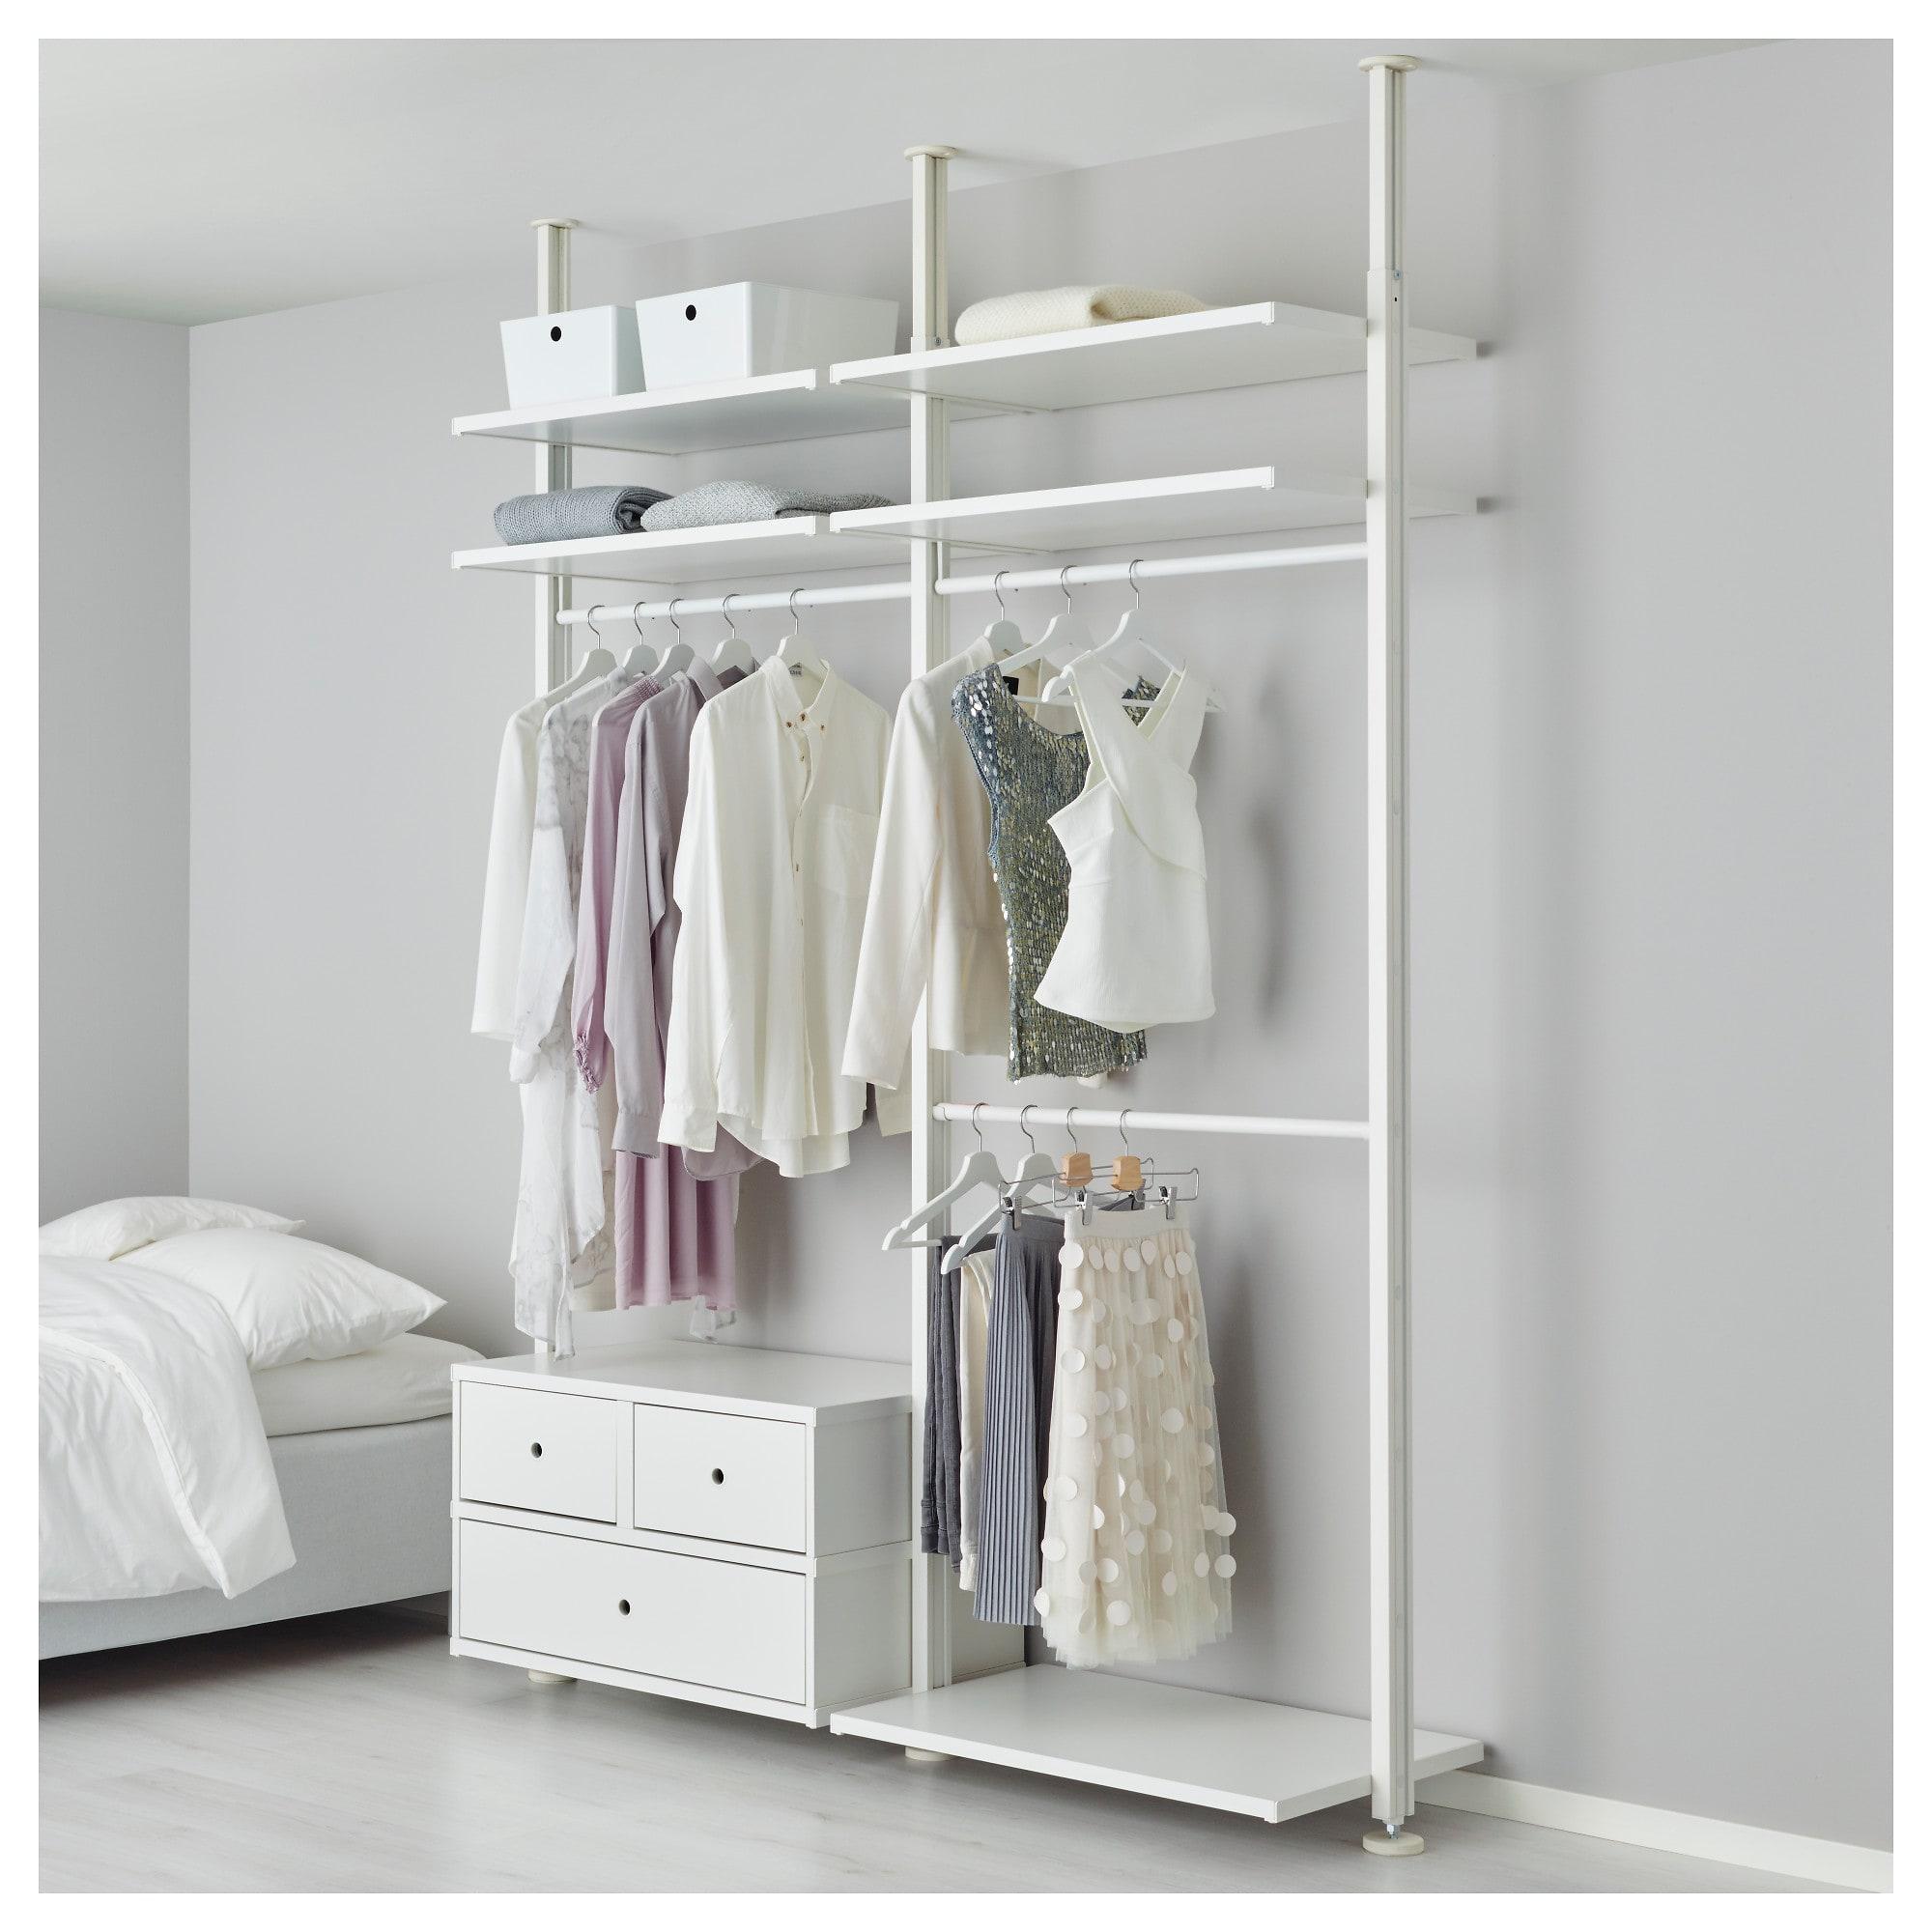 2 секции ЭЛВАРЛИ белый артикуль № 692.040.09 в наличии. Онлайн сайт IKEA Минск. Недорогая доставка и соборка.